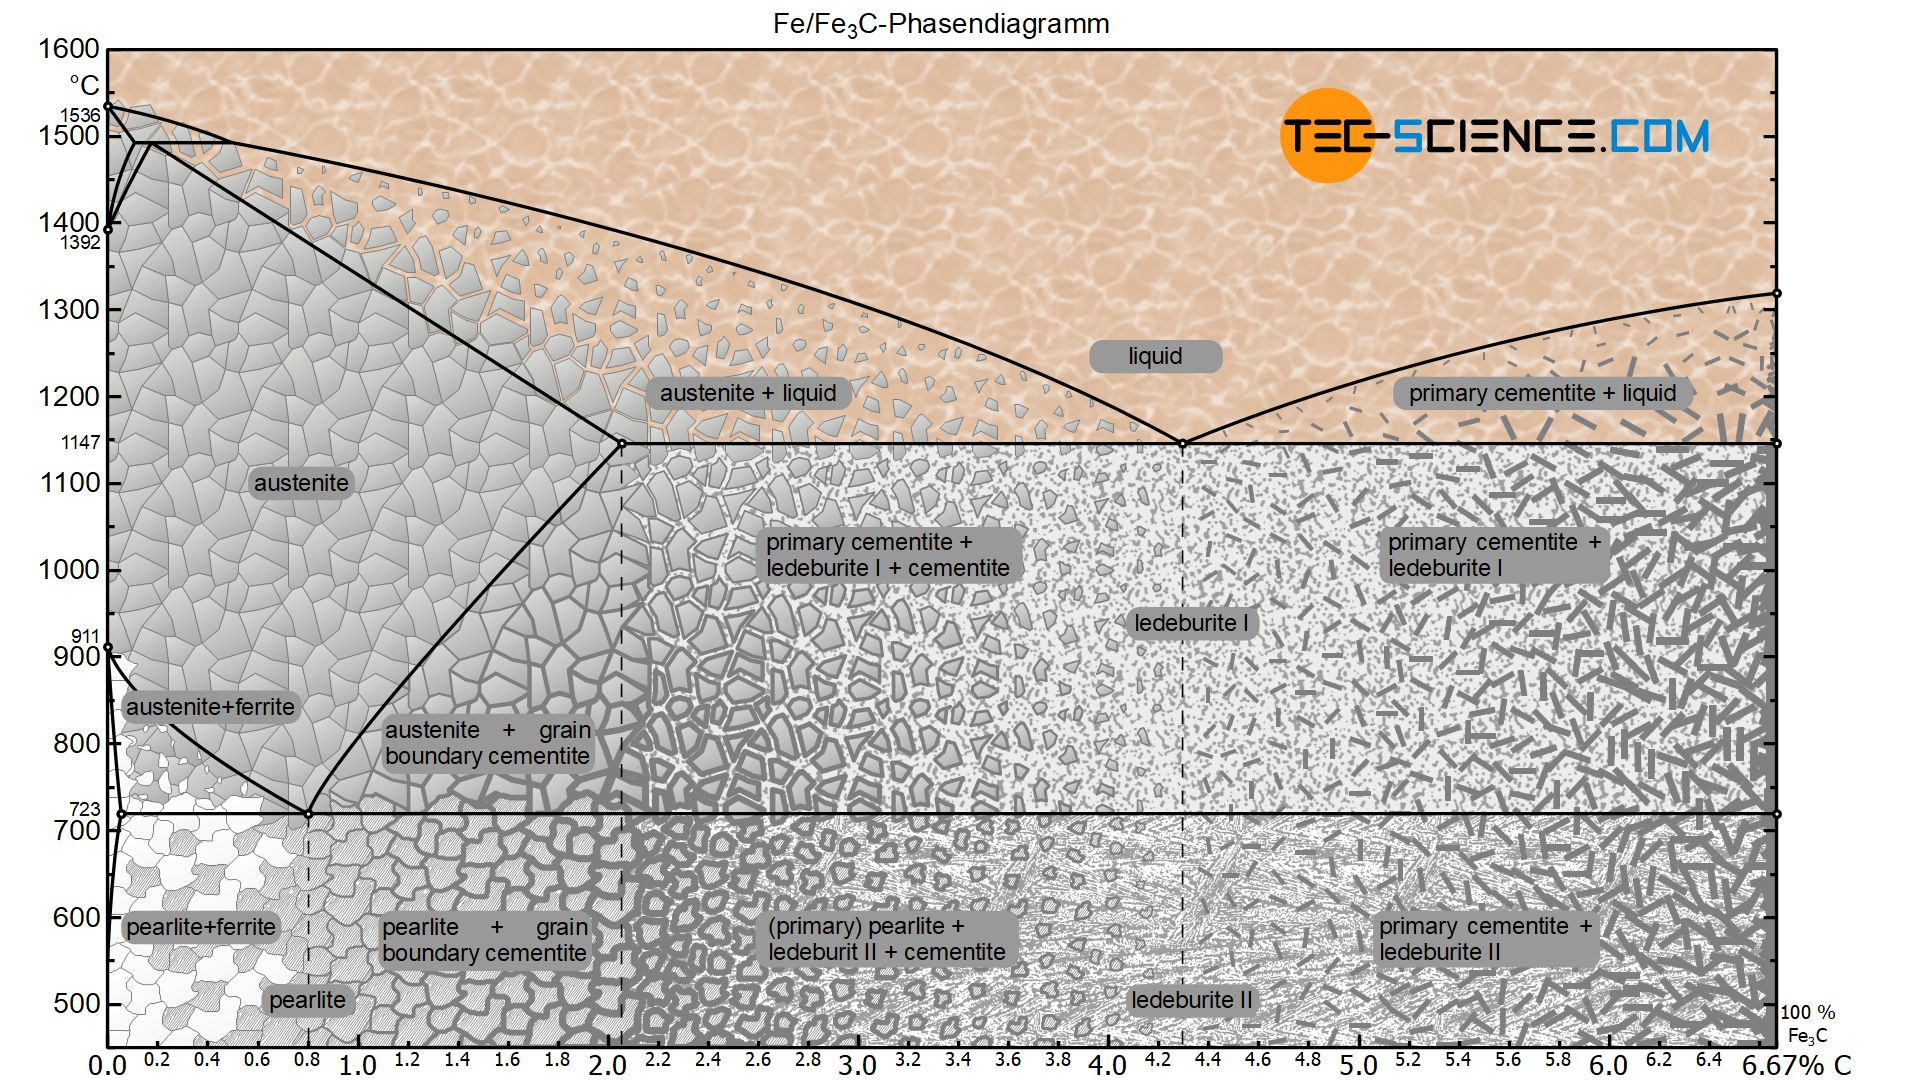 Complete iron-carbon phase diagram